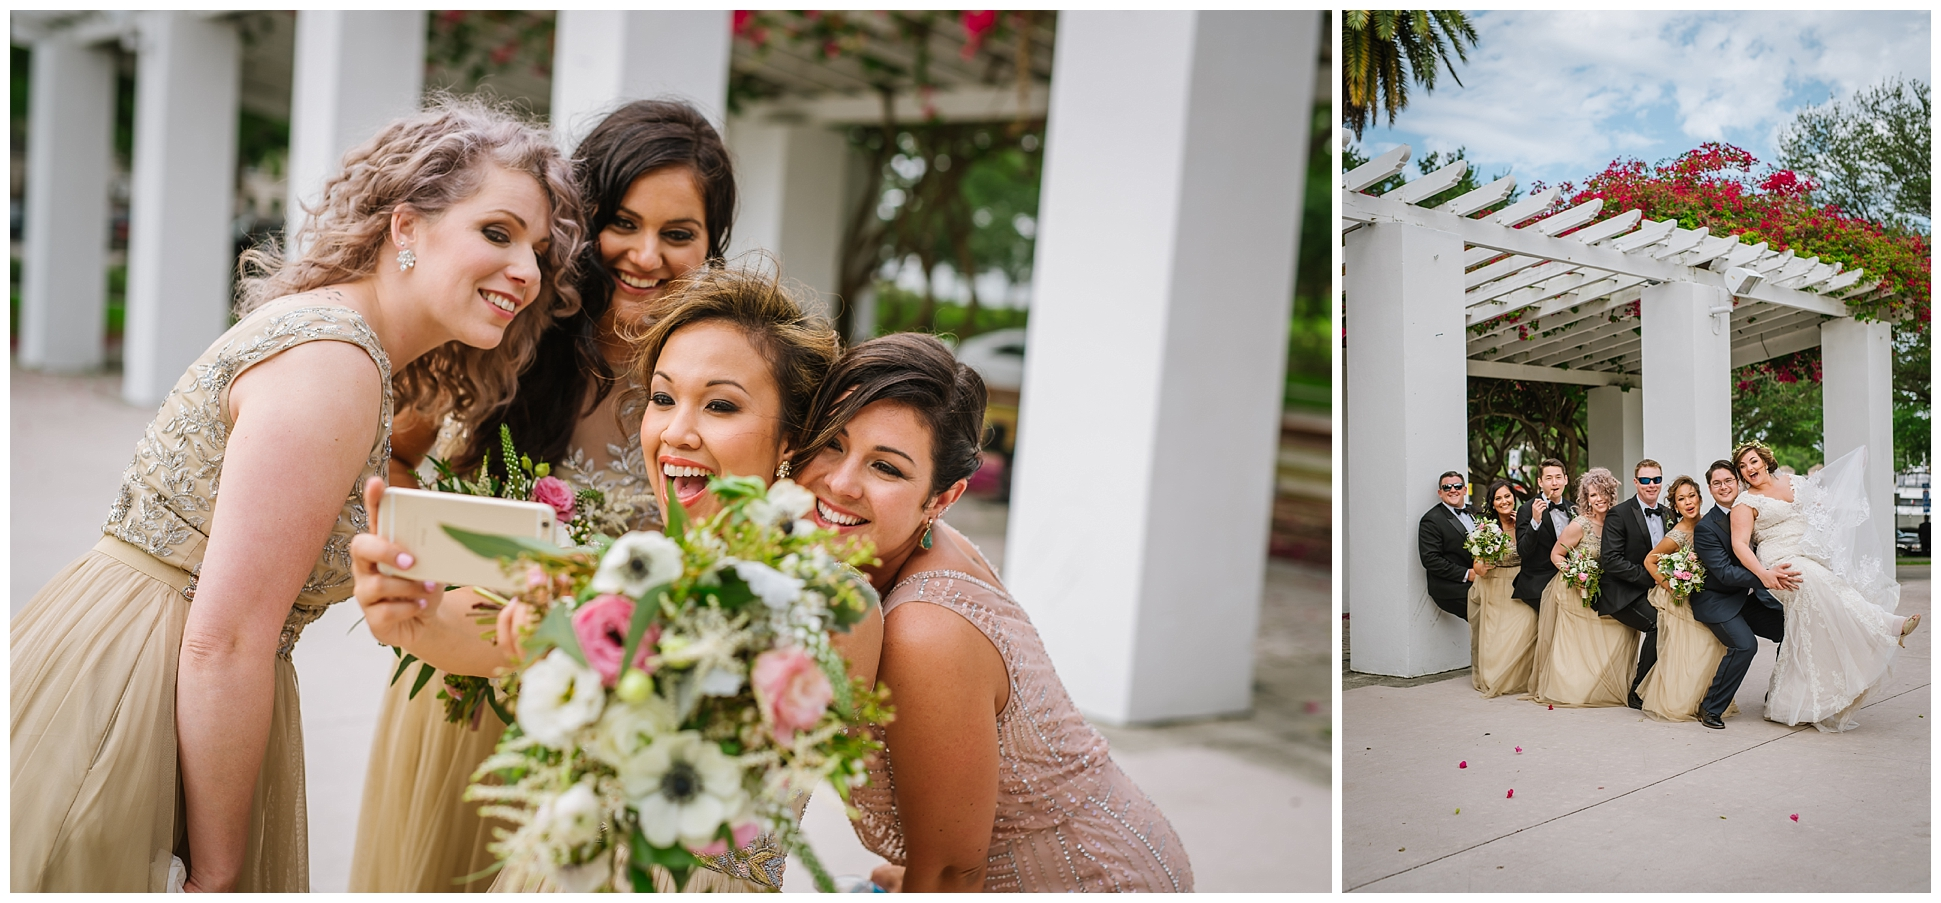 st-pete-wedding-photographer-italian-romance-theme-rustic-flower-crown_0412.jpg